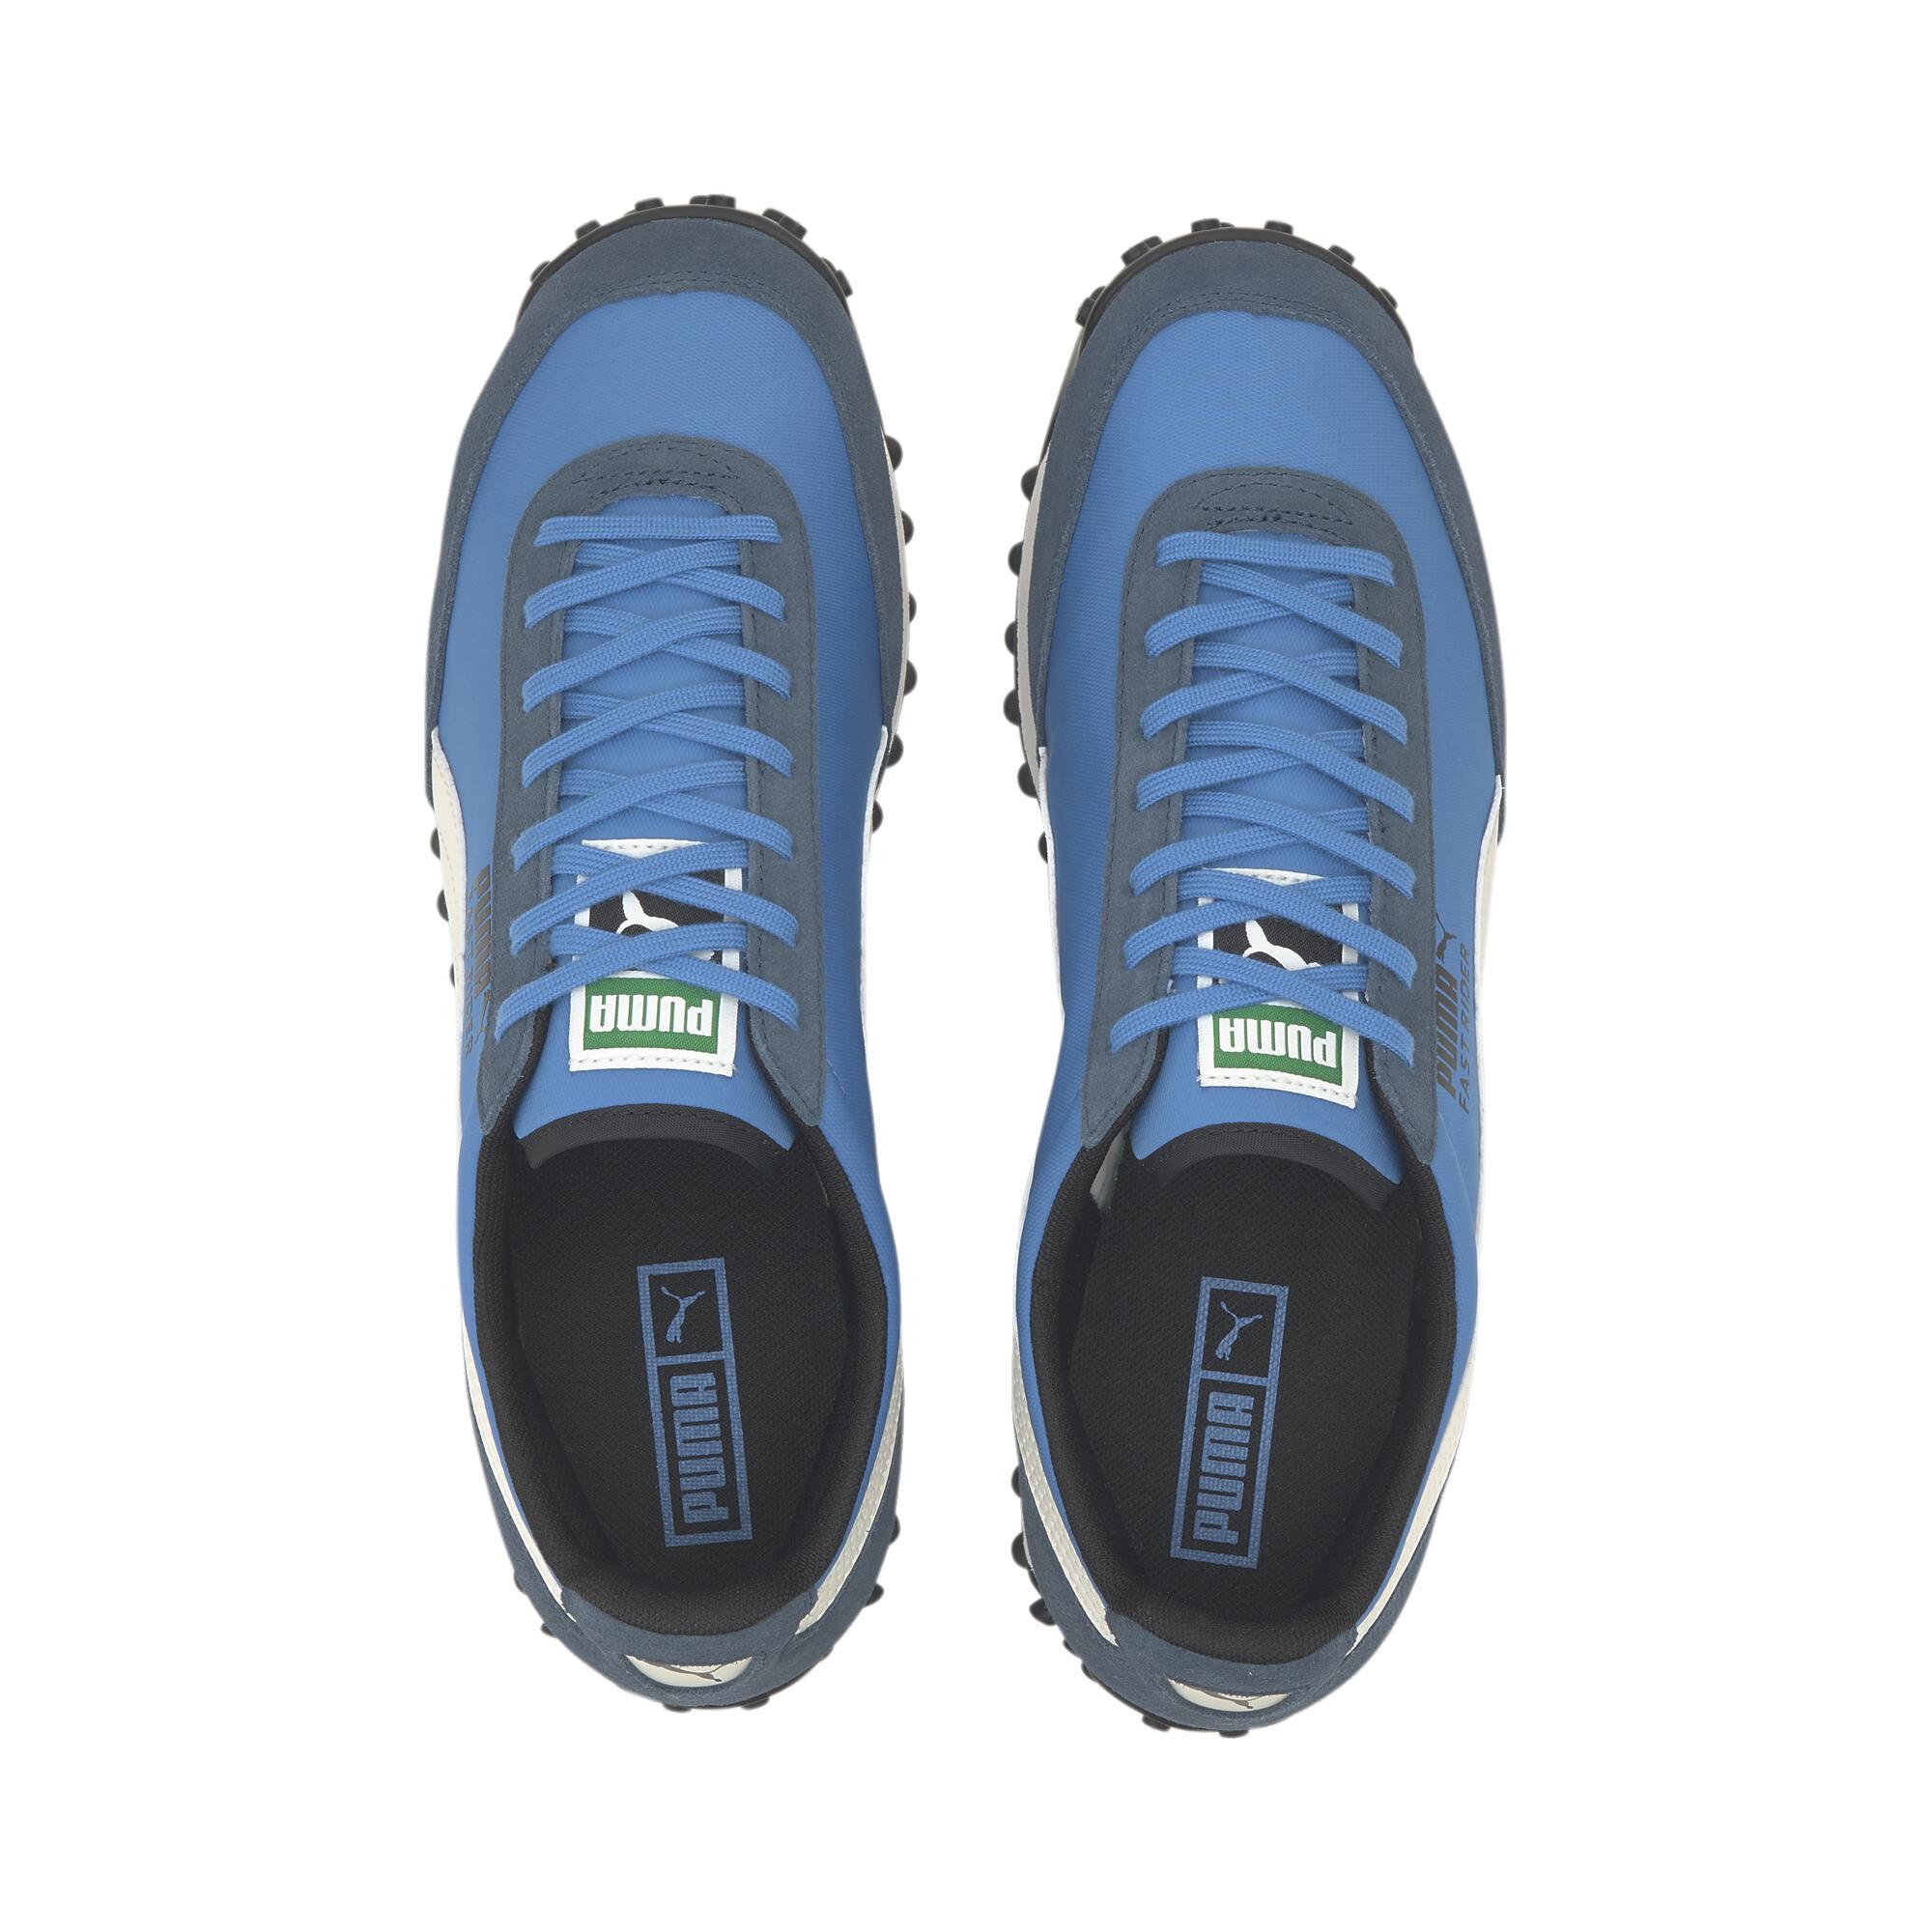 PUMA-Men-039-s-Fast-Rider-Source-Sneakers thumbnail 8